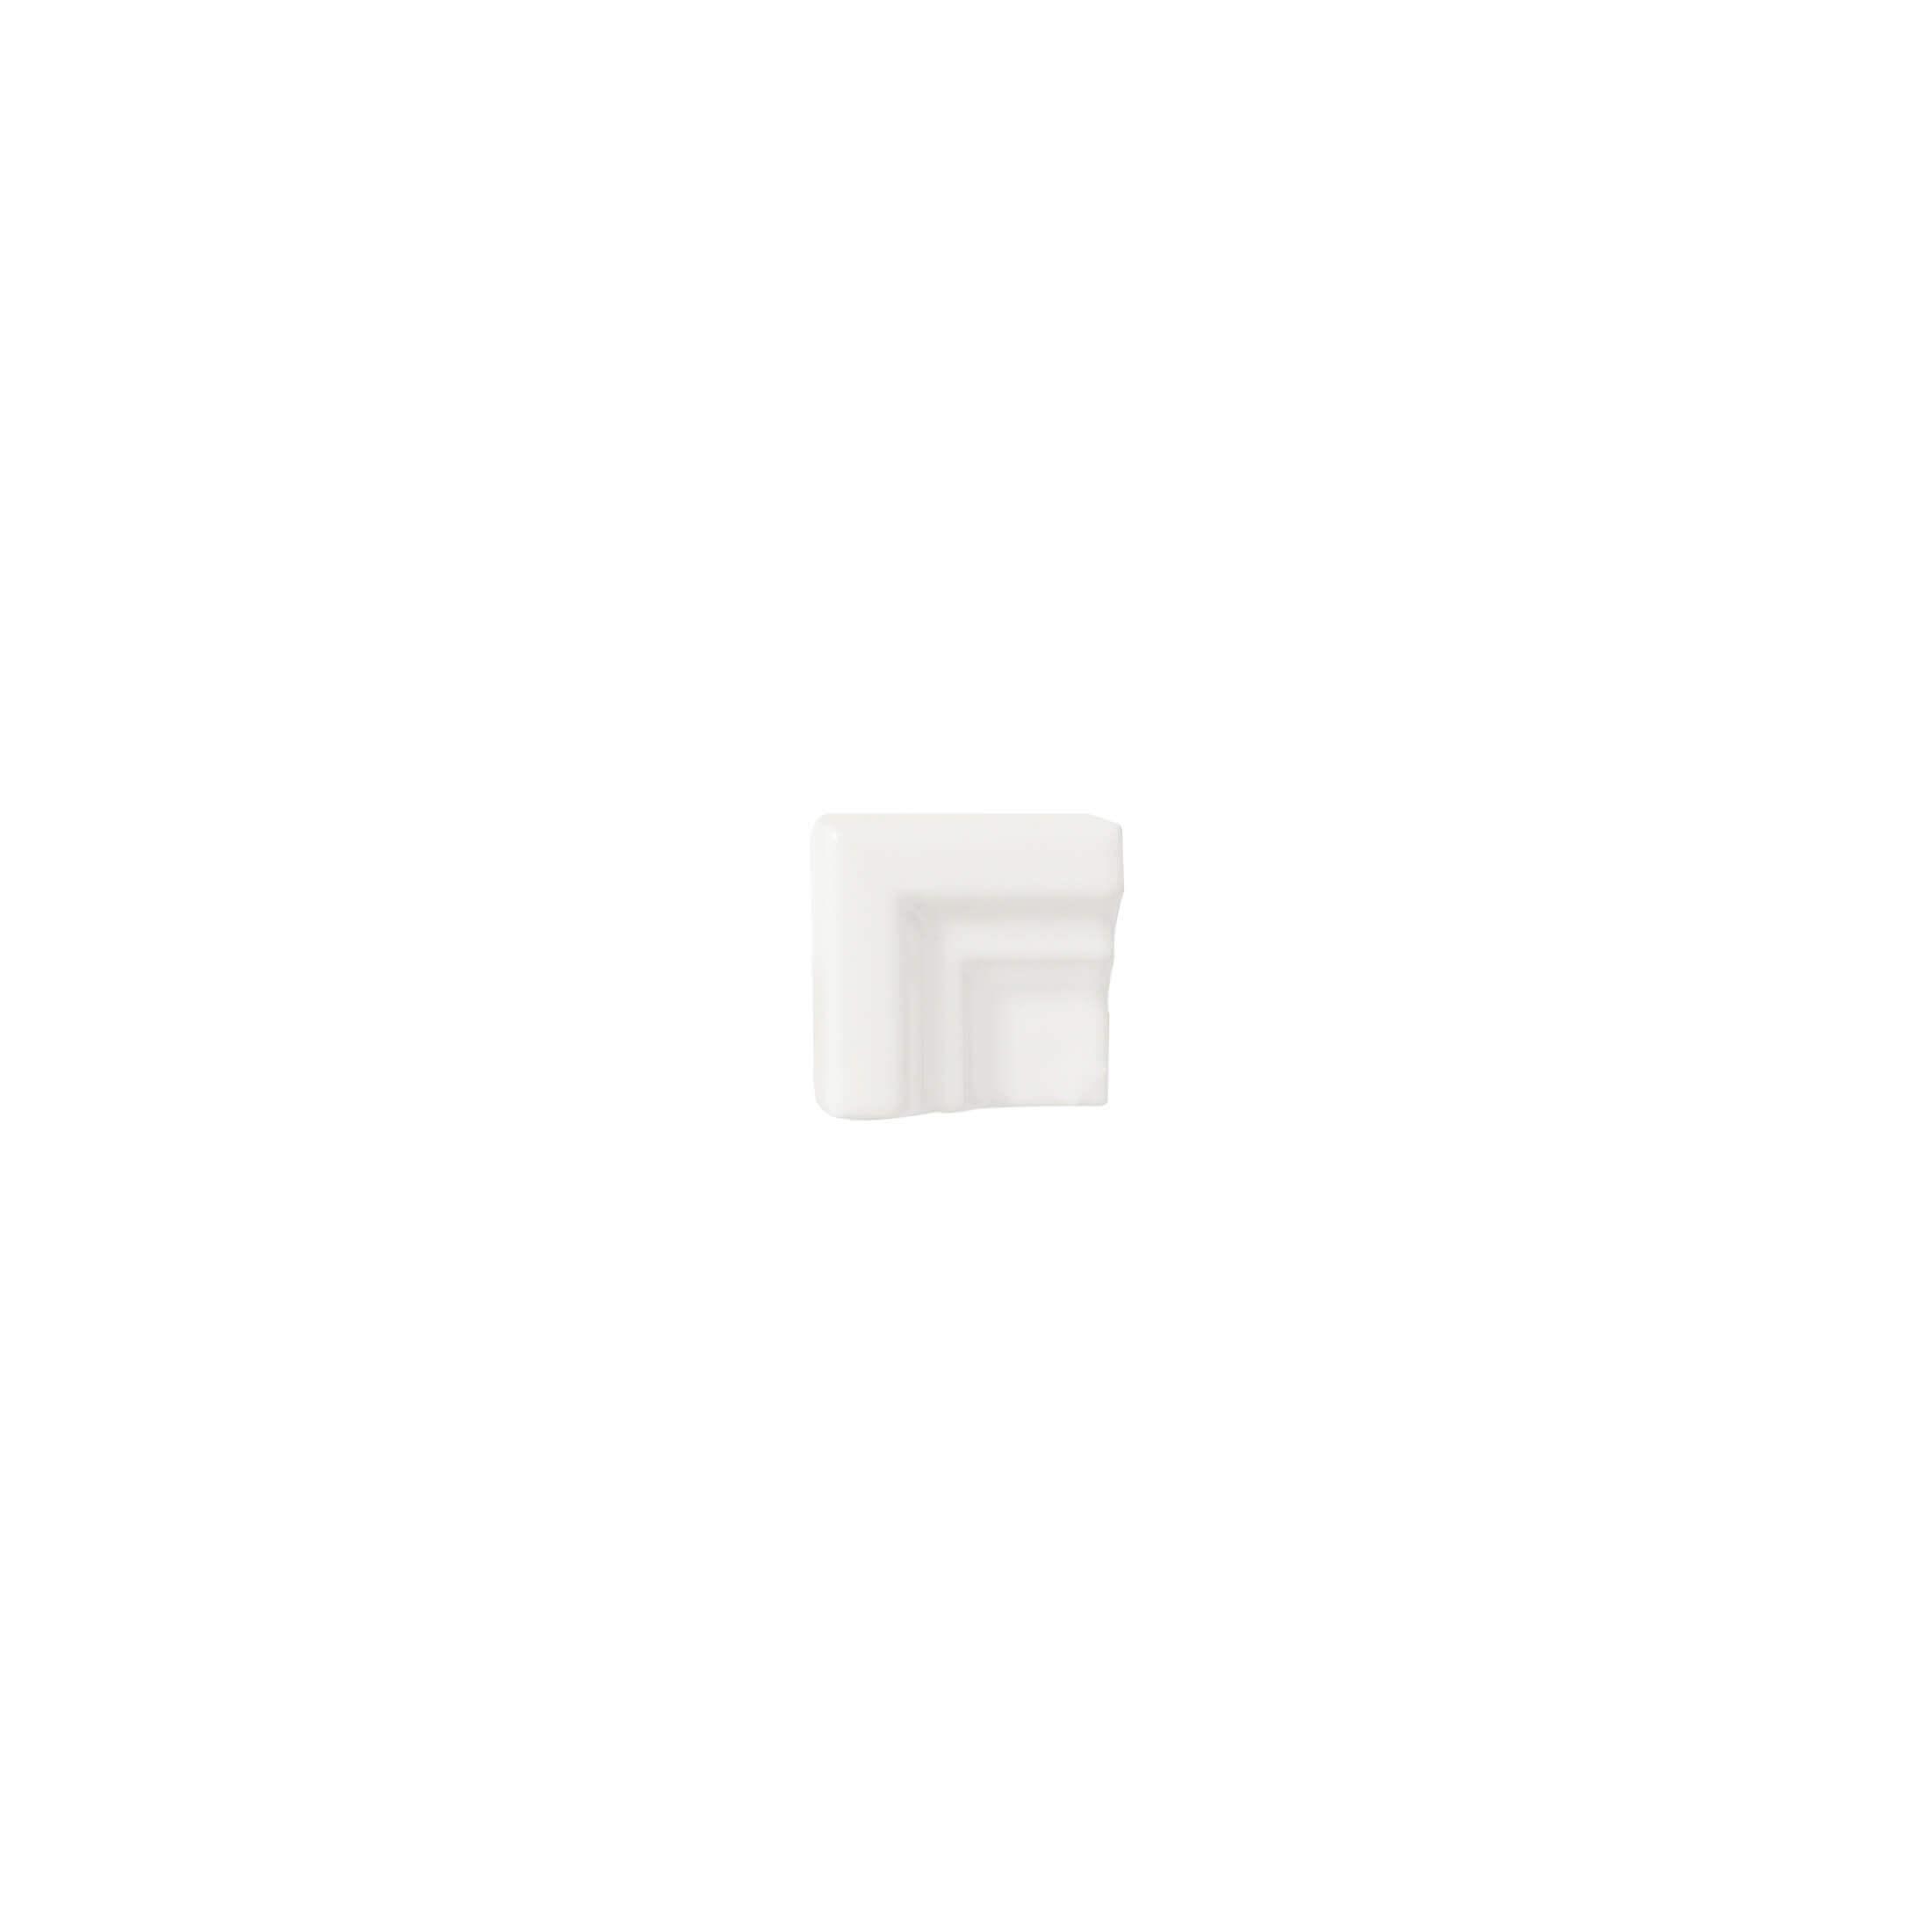 ADST5287 - ANGULO MARCO CORNISA - 5 cm X 19.8 cm